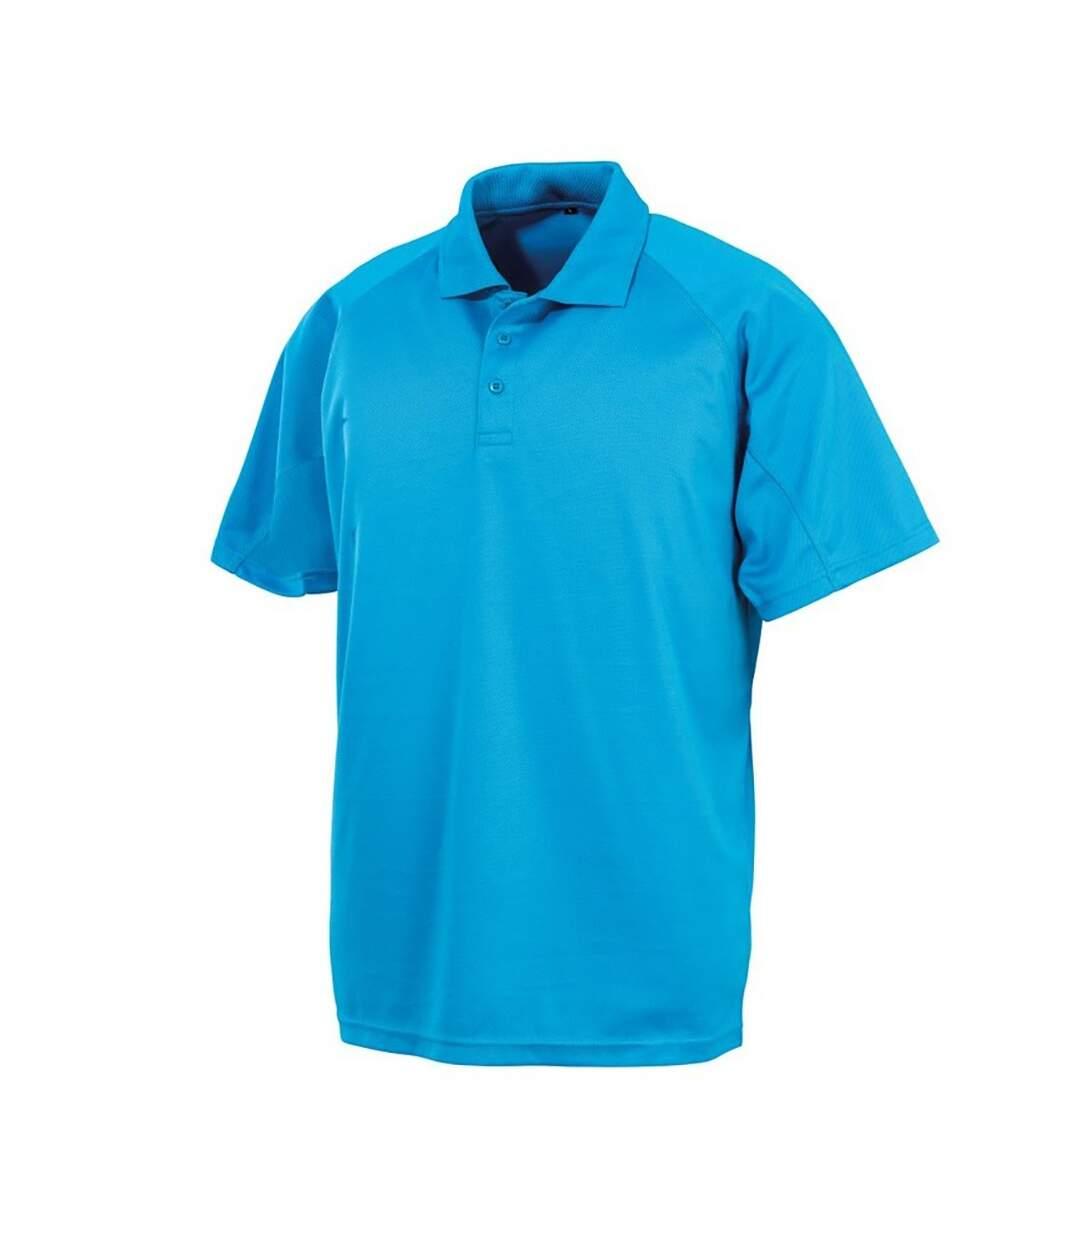 Spiro Impact Mens Performance Aircool Polo T-Shirt (Bottle Green) - UTBC4115